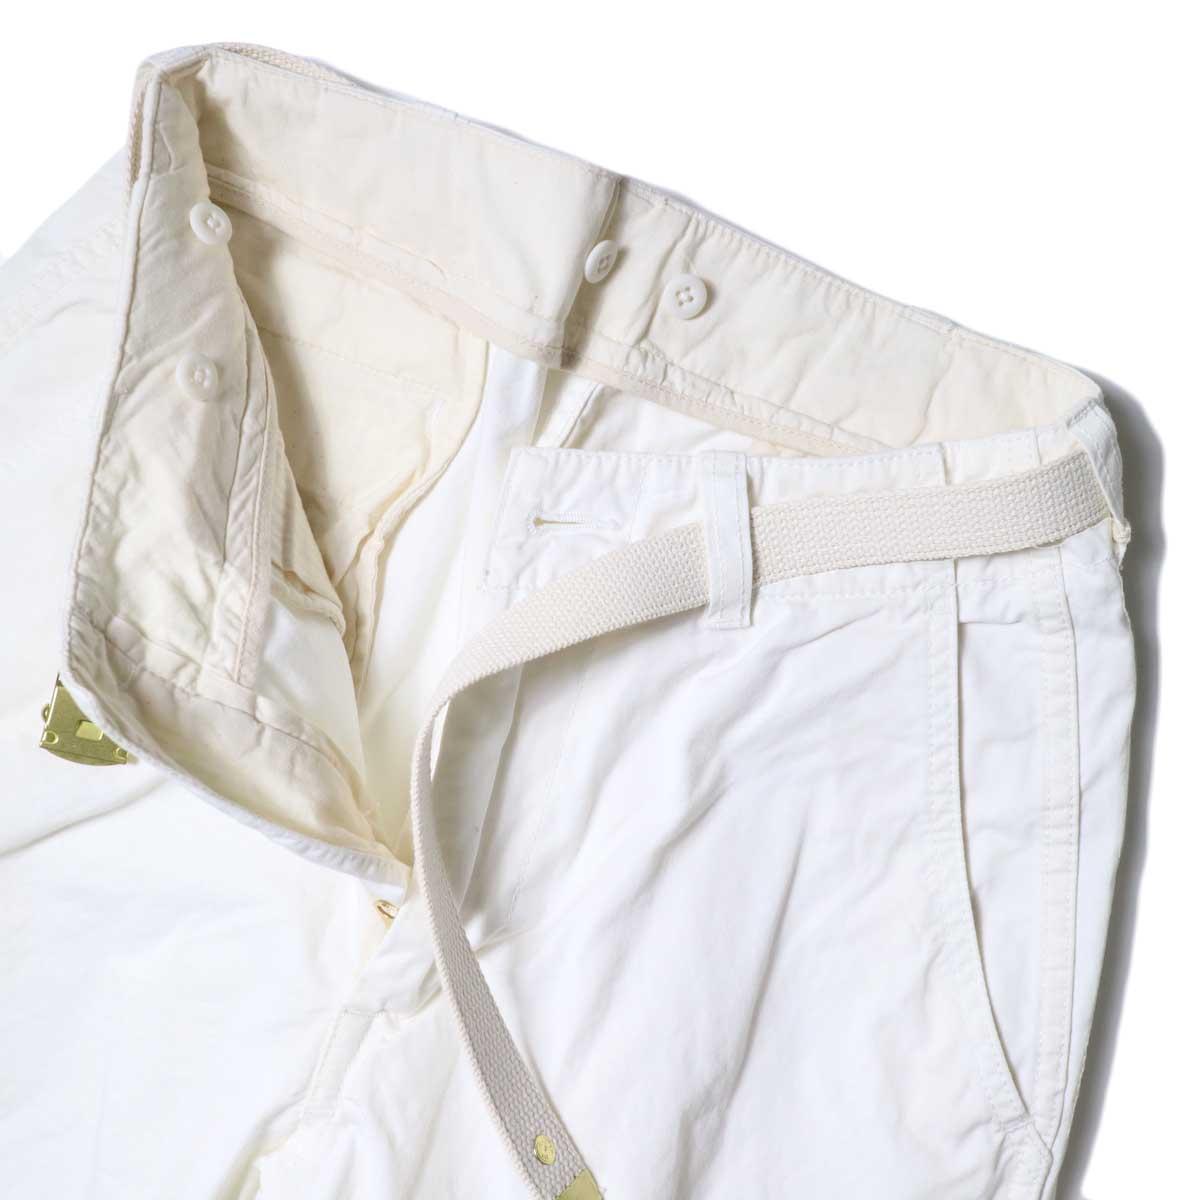 Master&Co. / CUT OFF PANTS (White) フロントアップ②